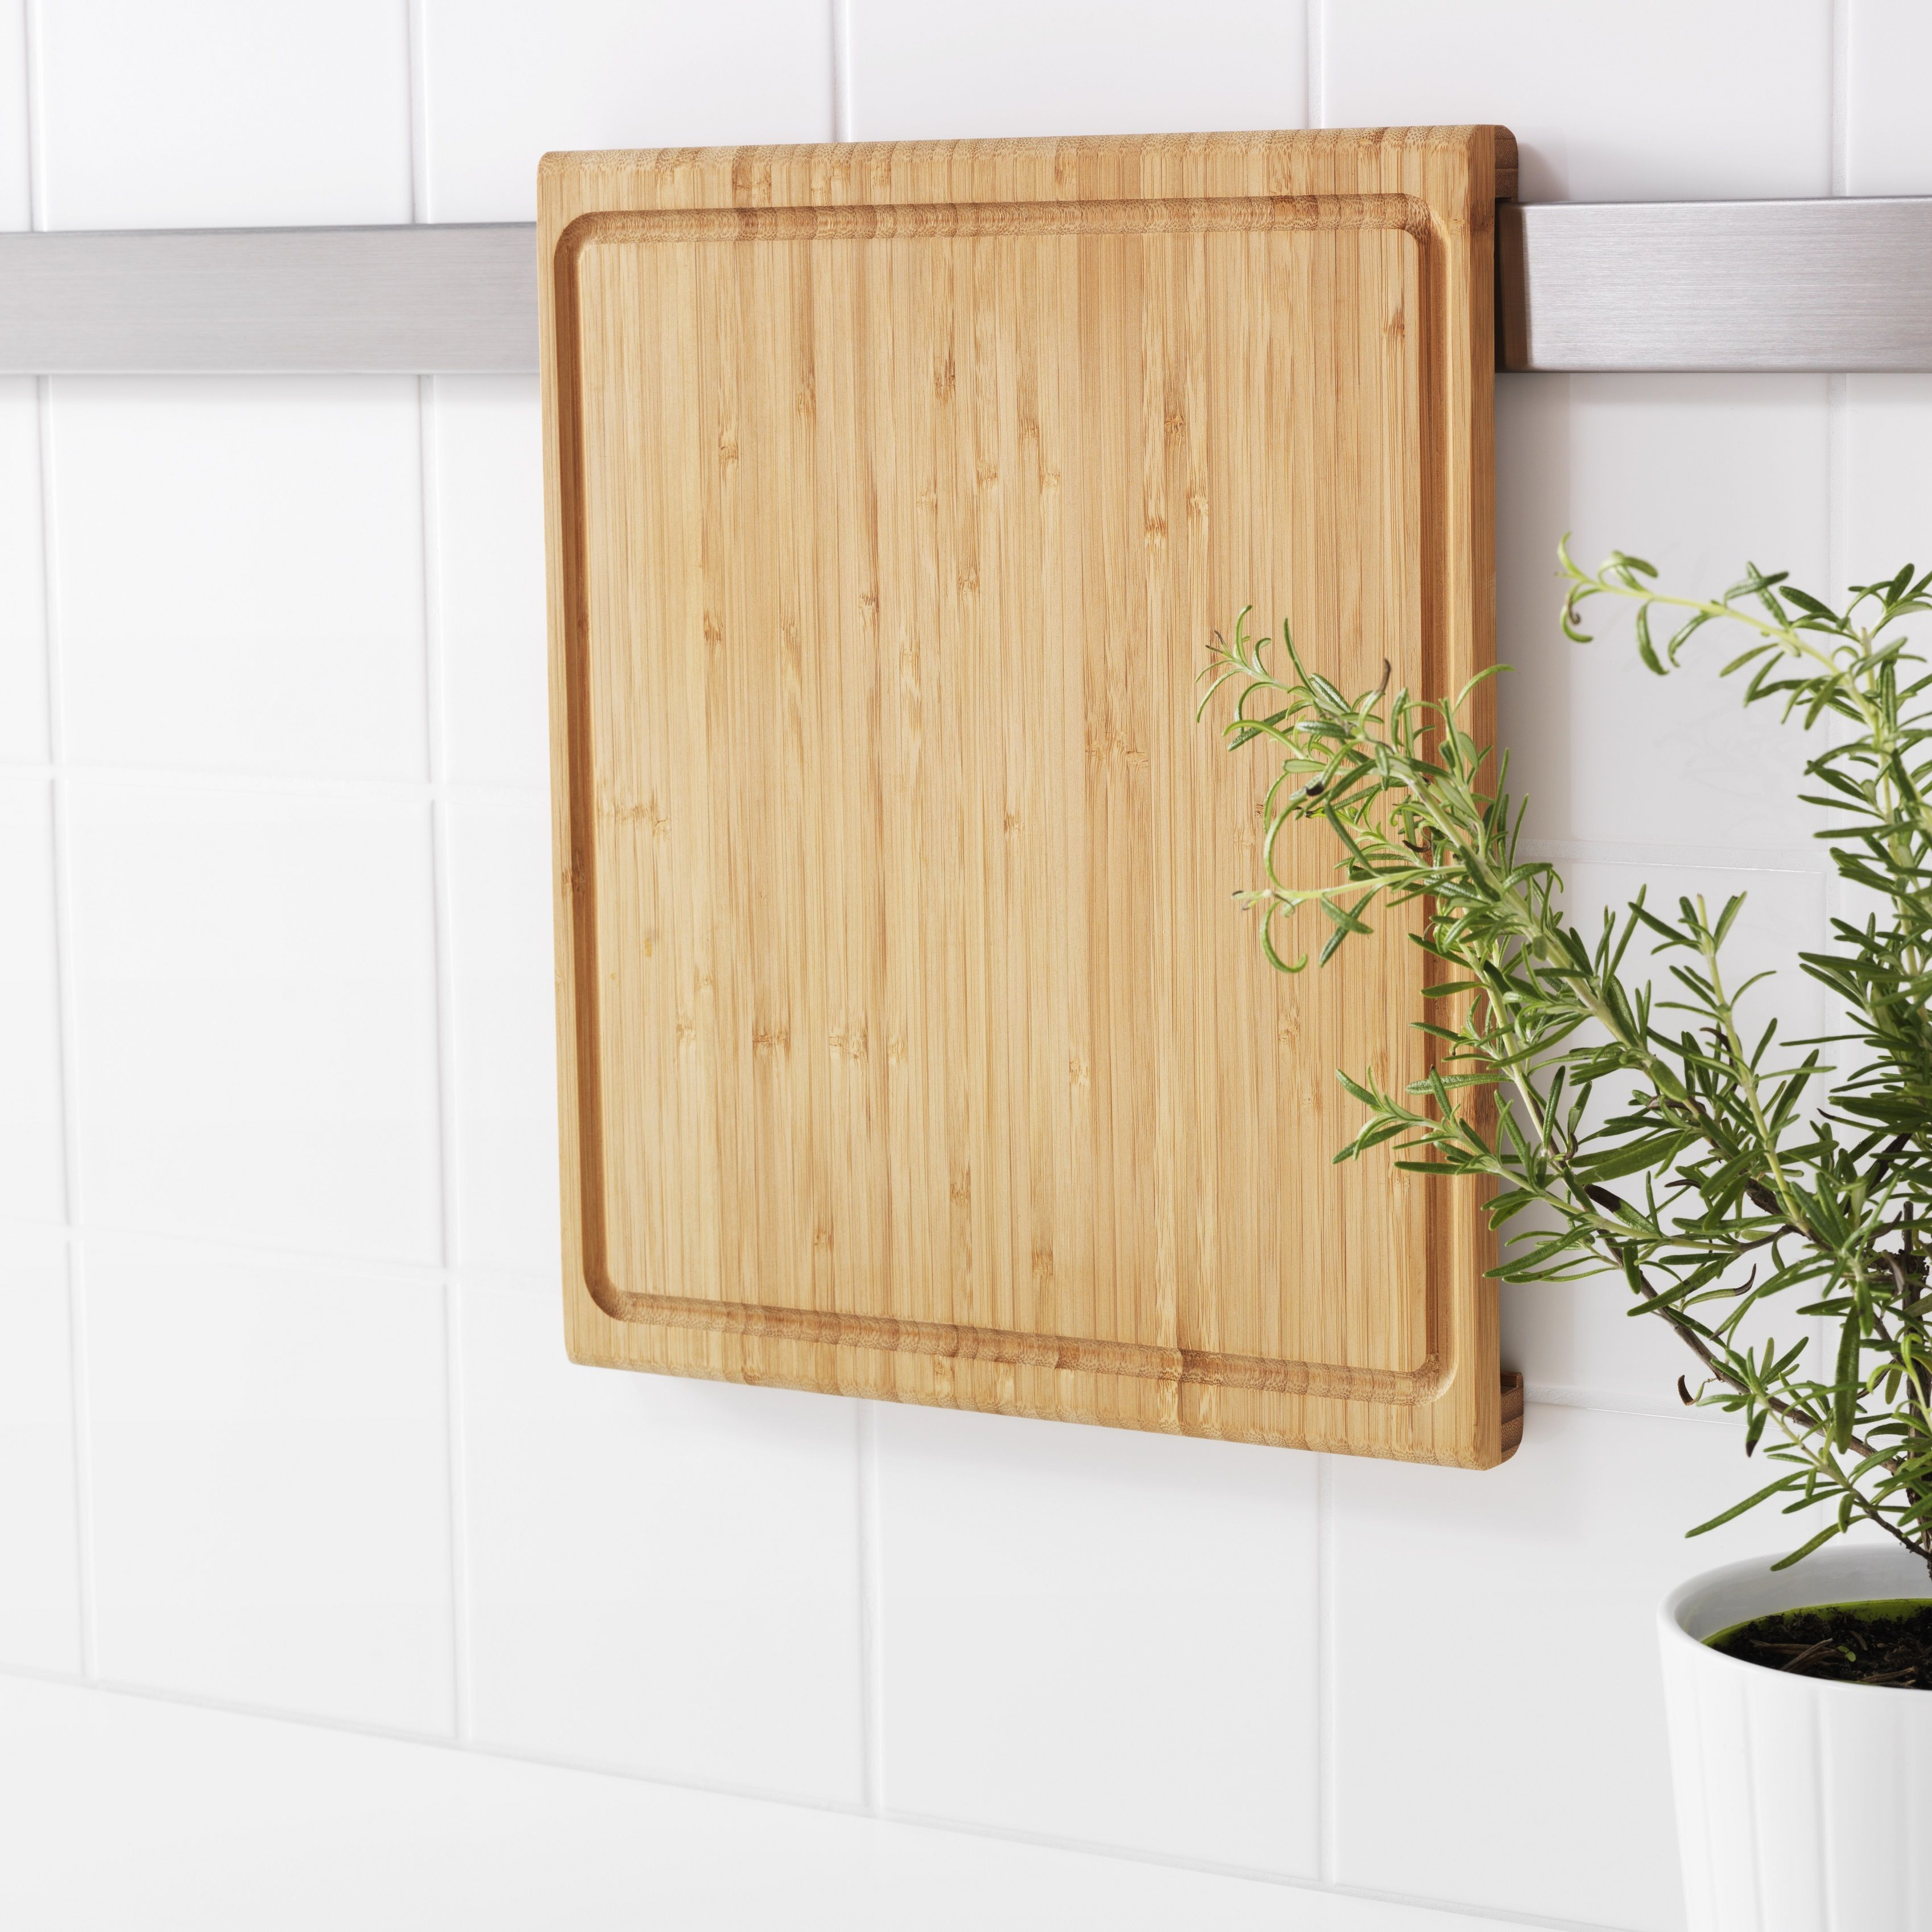 rimforsa snijplank bamboe kitchens